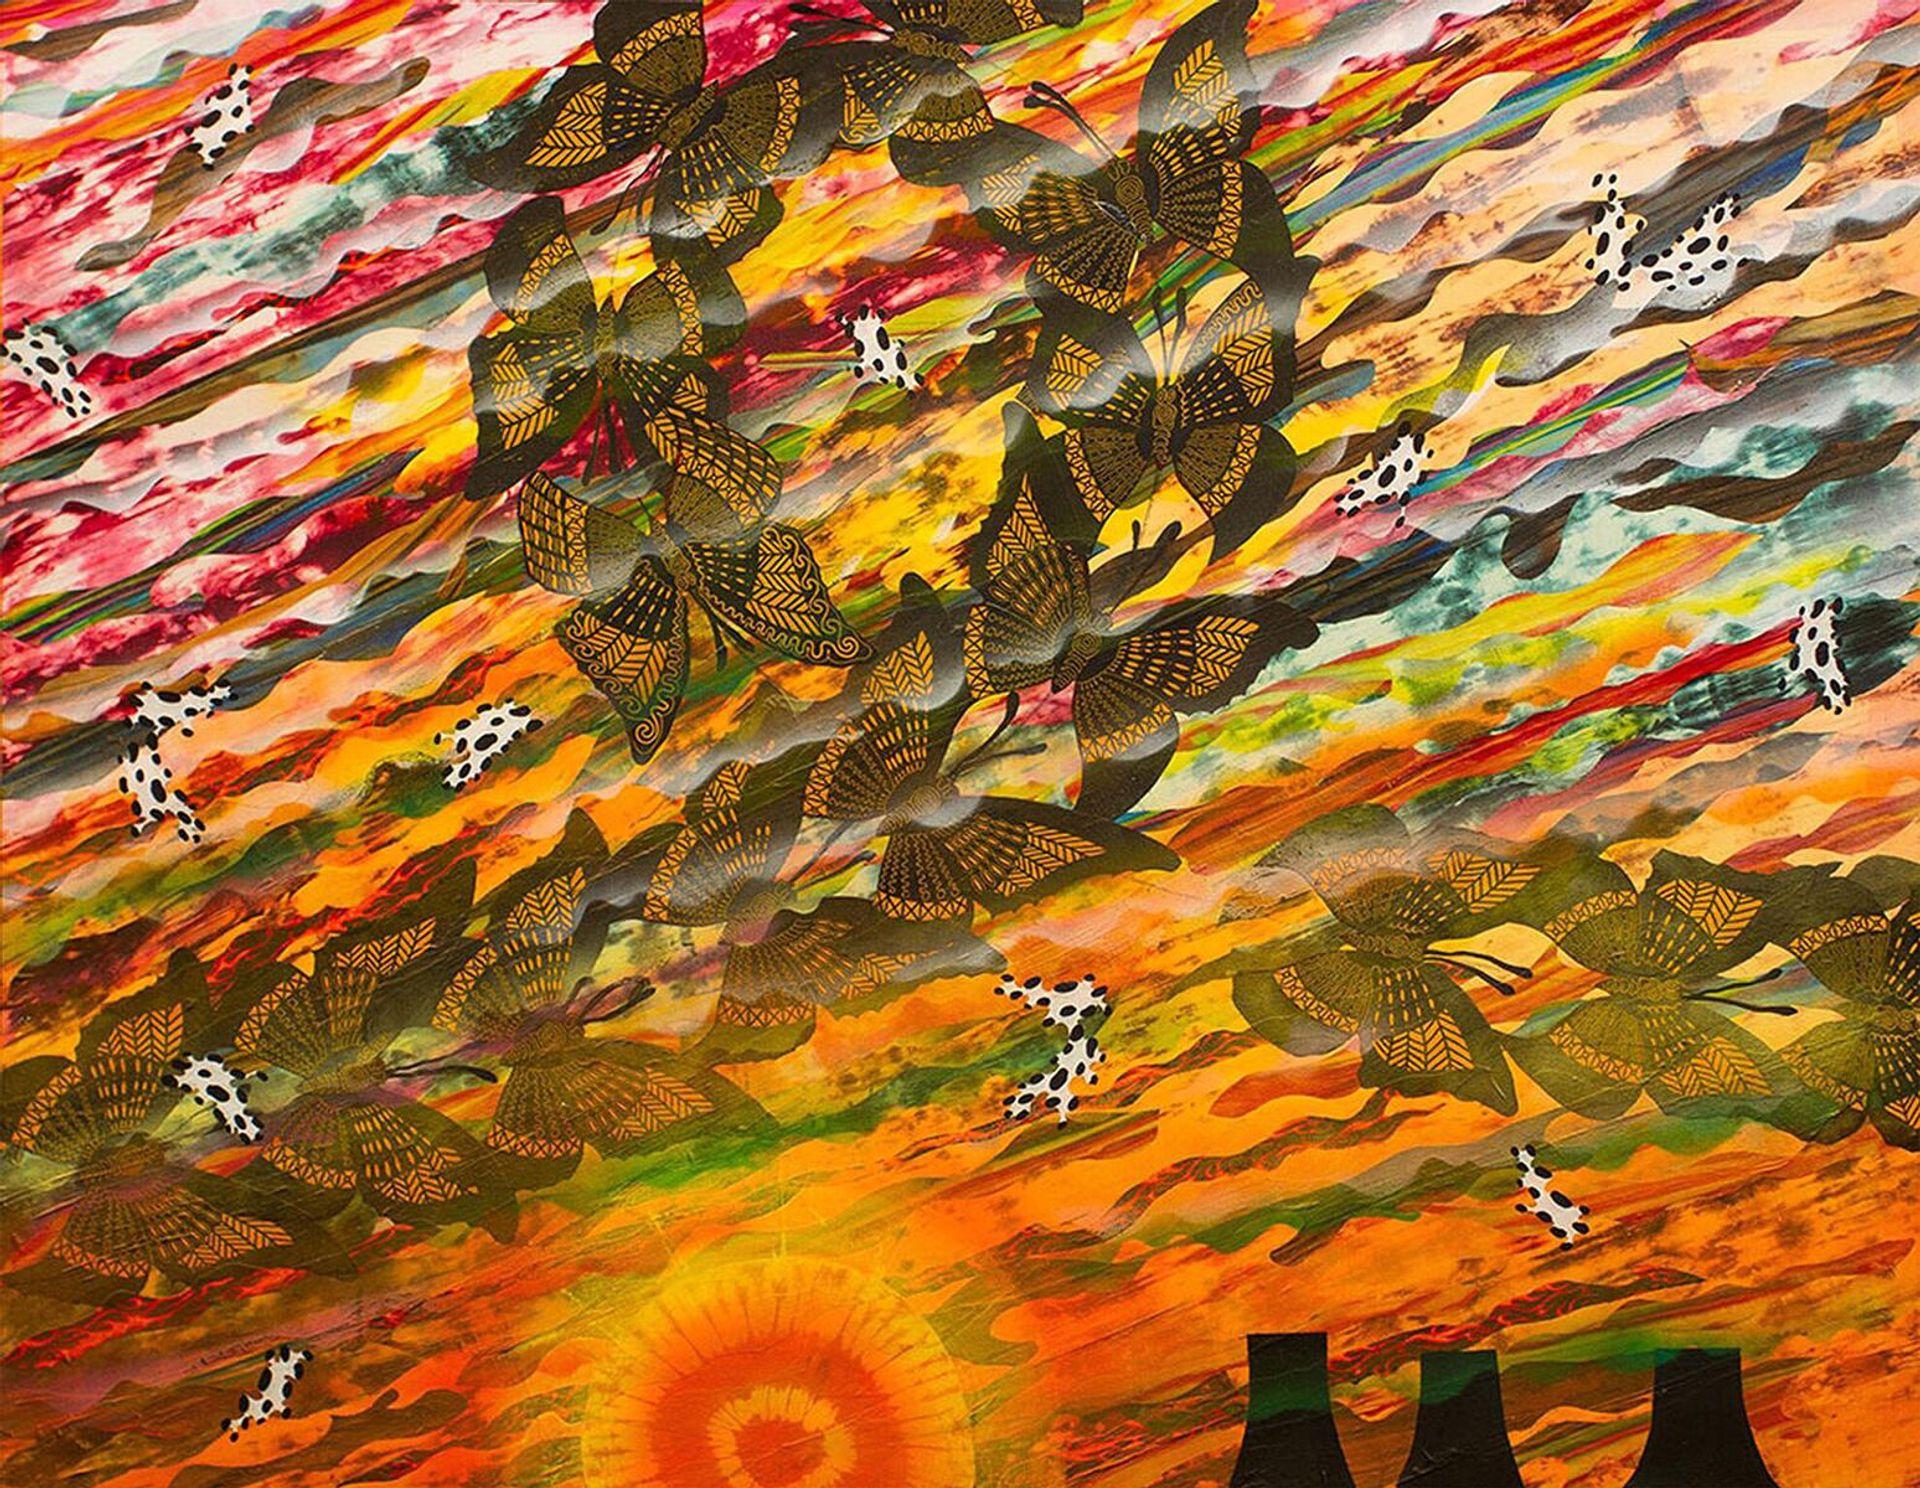 Merion Estes, Los Alamos Sunset (2014),  at the Craft & Folk Art Museum Photo: Matt Kazmer; courtesy of the artist